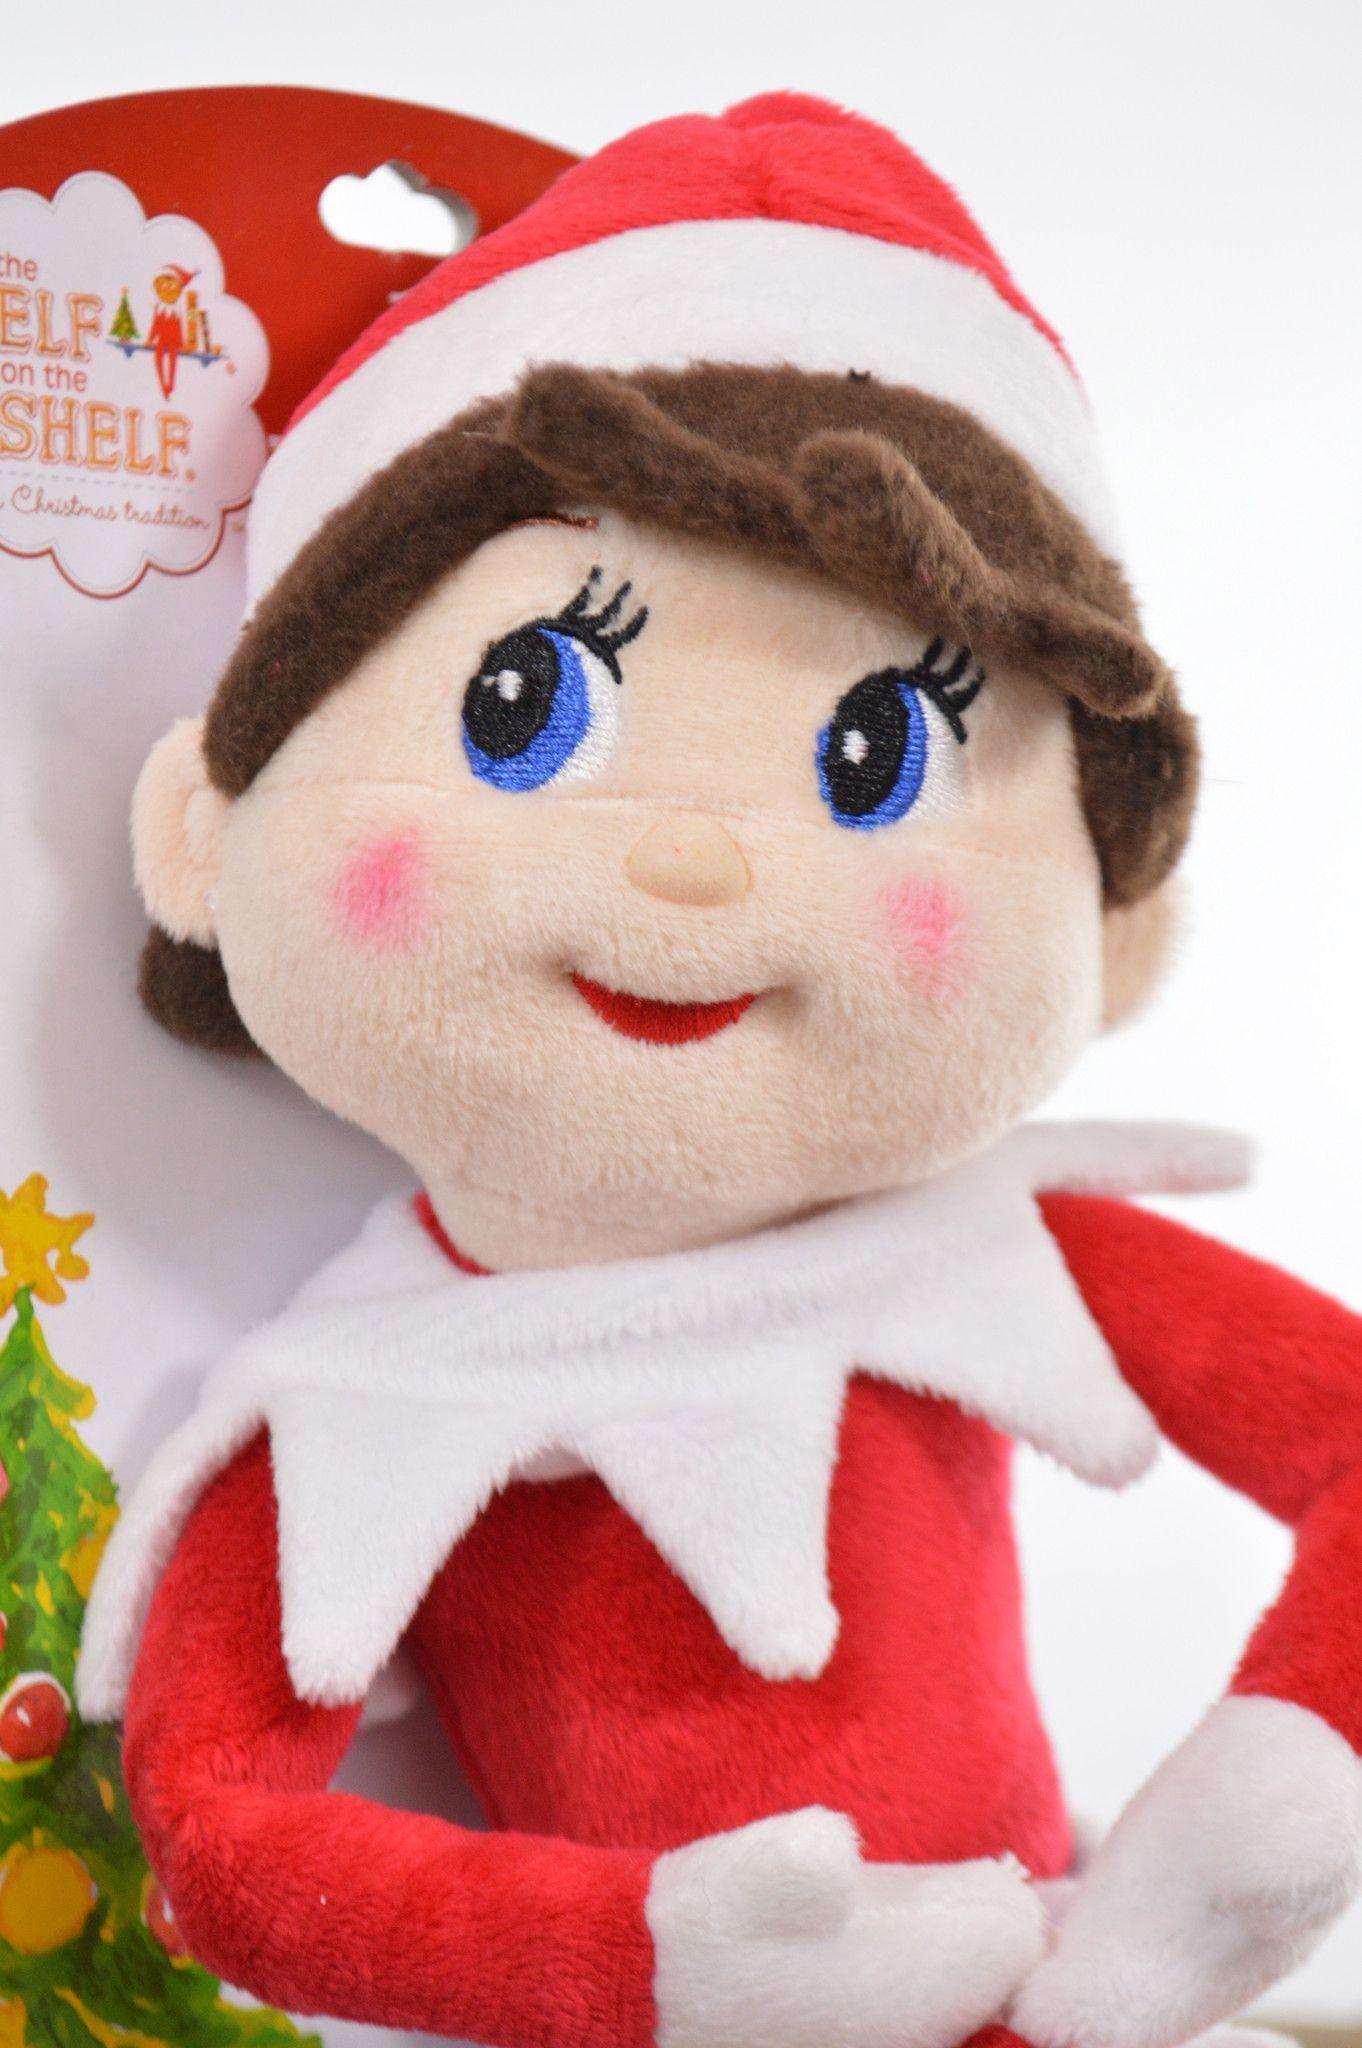 Elf On The Shelf Plushee Pals Brand New 13 Girl Plush Doll Elf